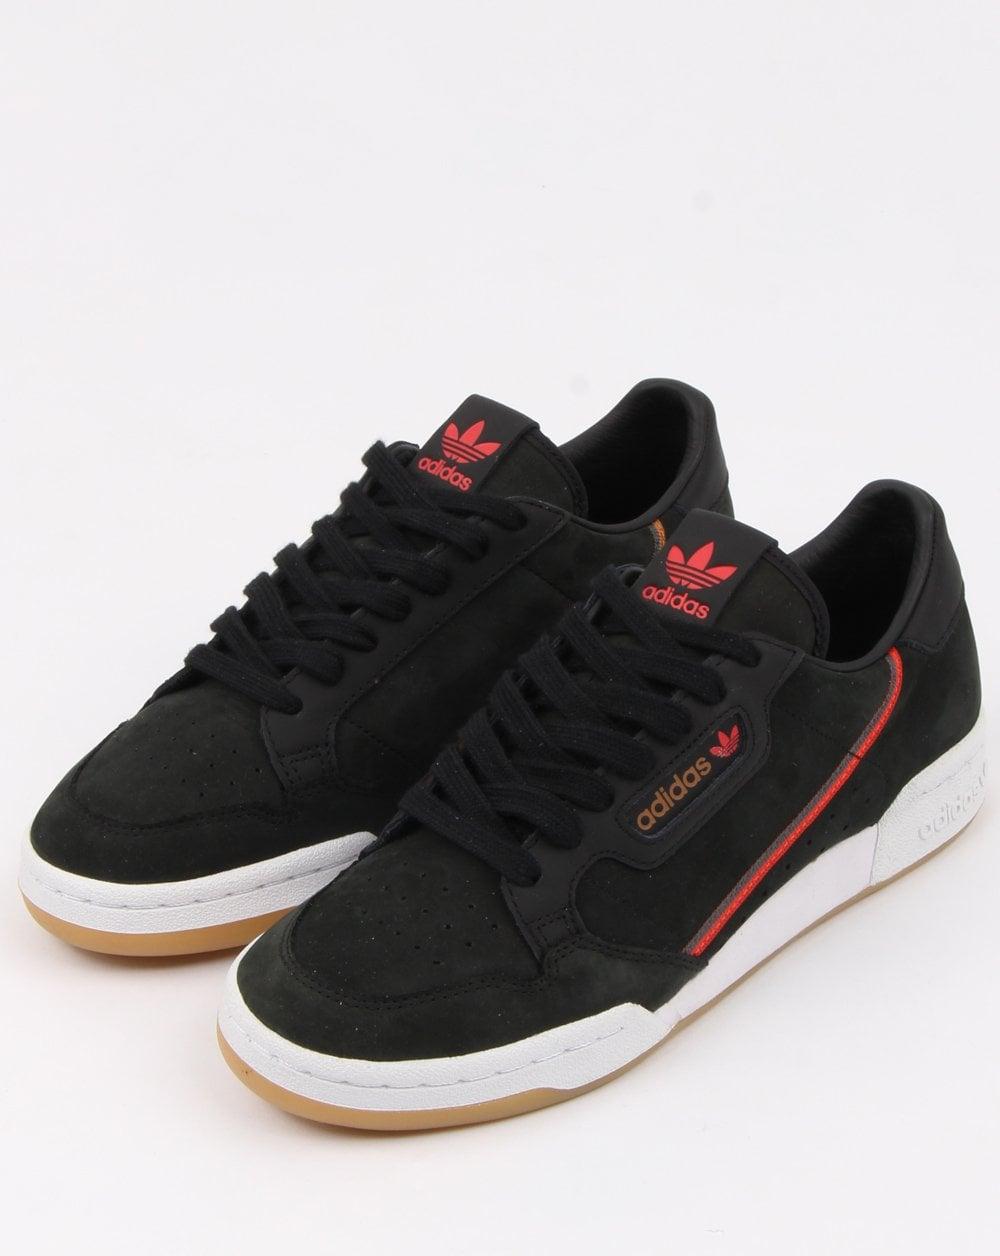 Adidas Continental 80 x TFL Trainers Black red brown 8392365ec